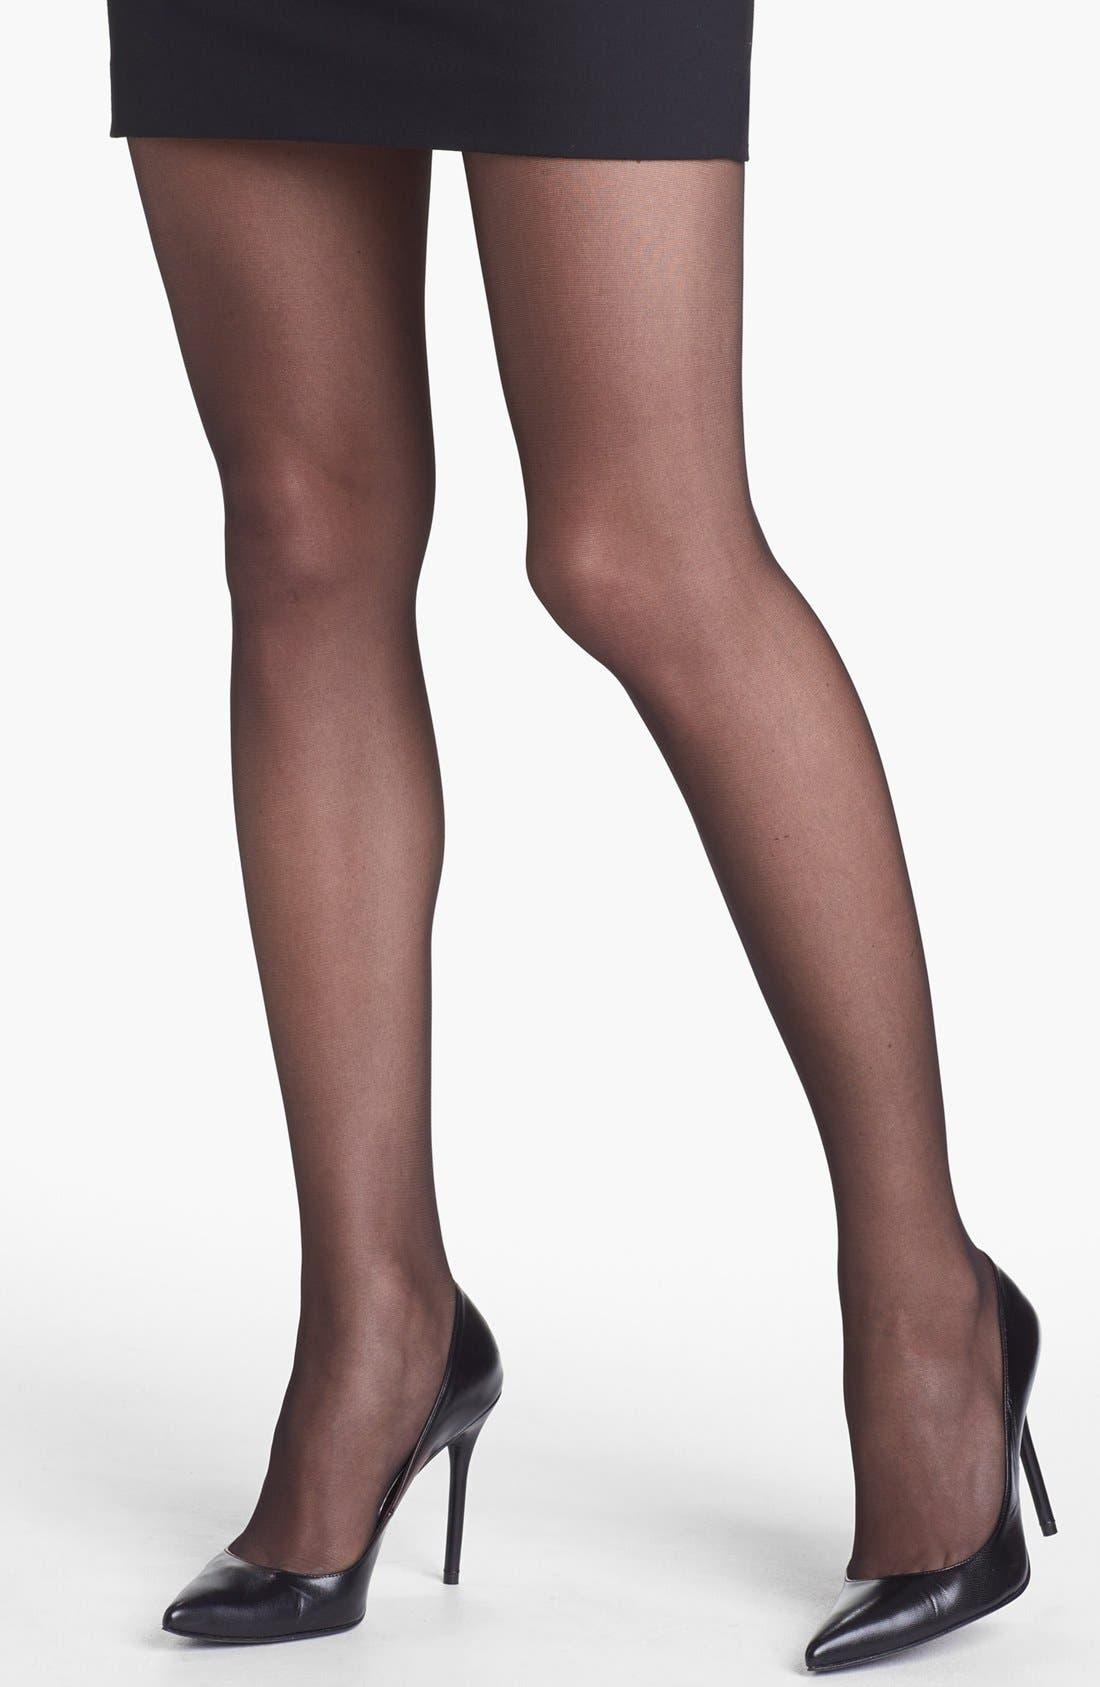 French cut pantyhose